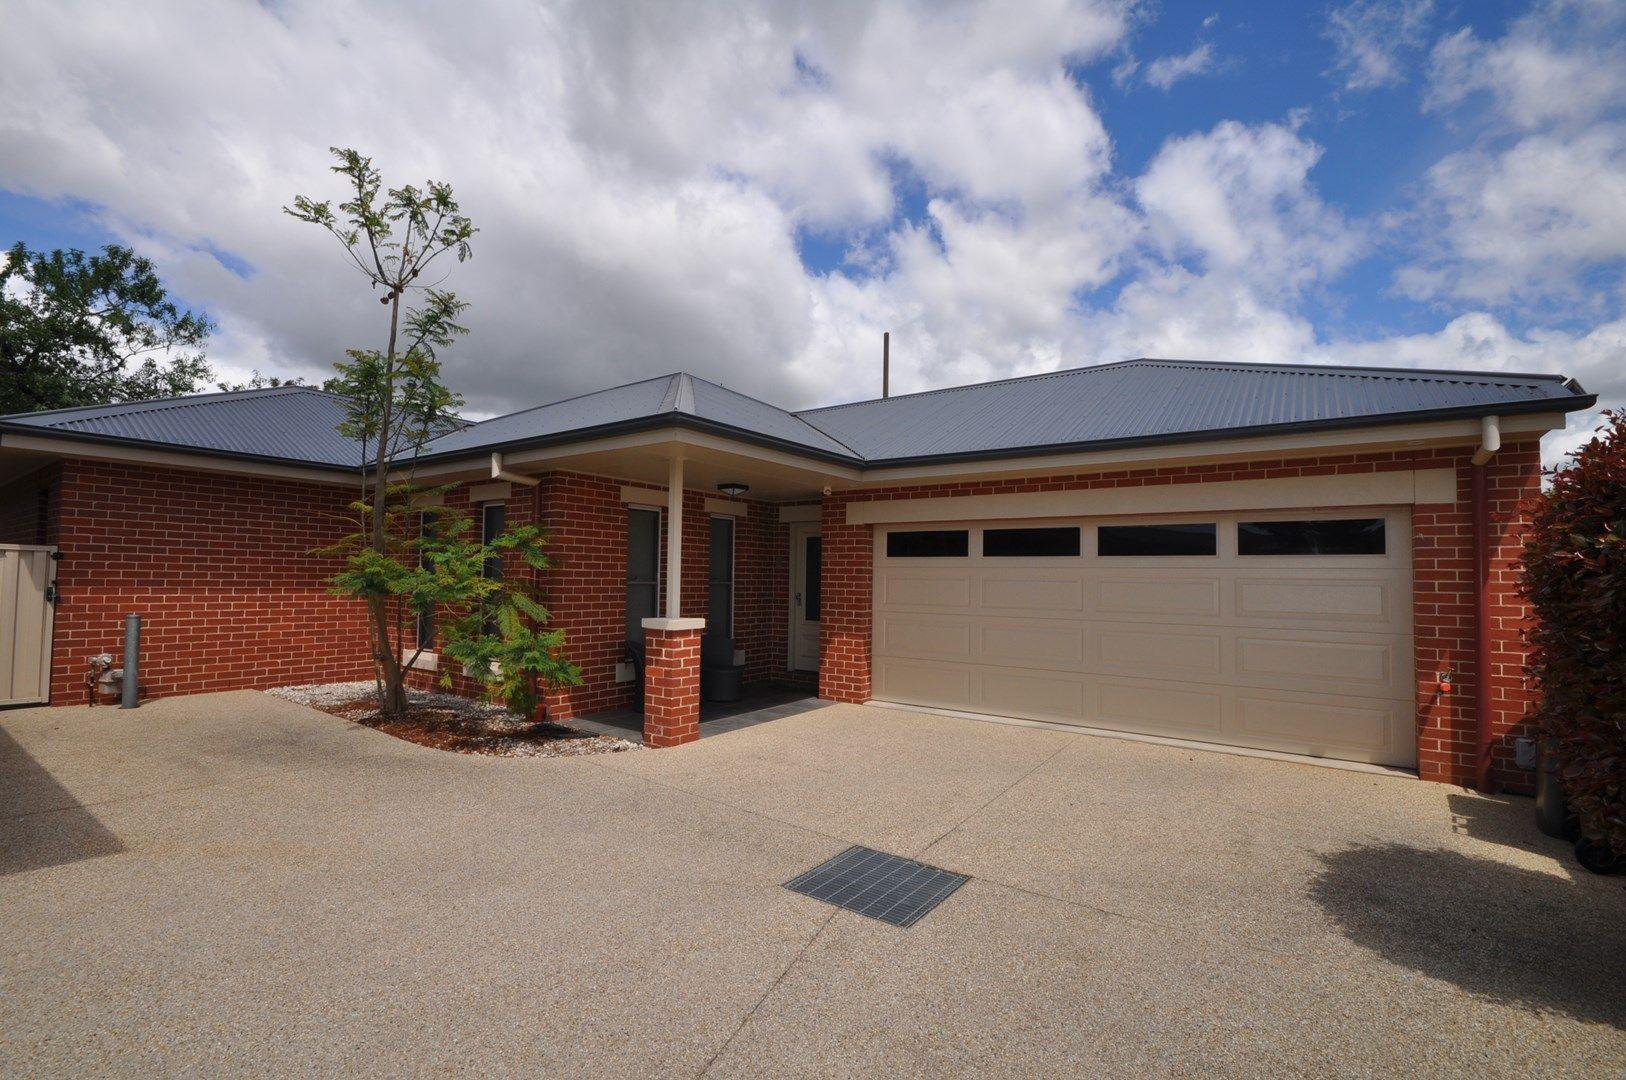 3/483 Schubach Street, East Albury NSW 2640, Image 0